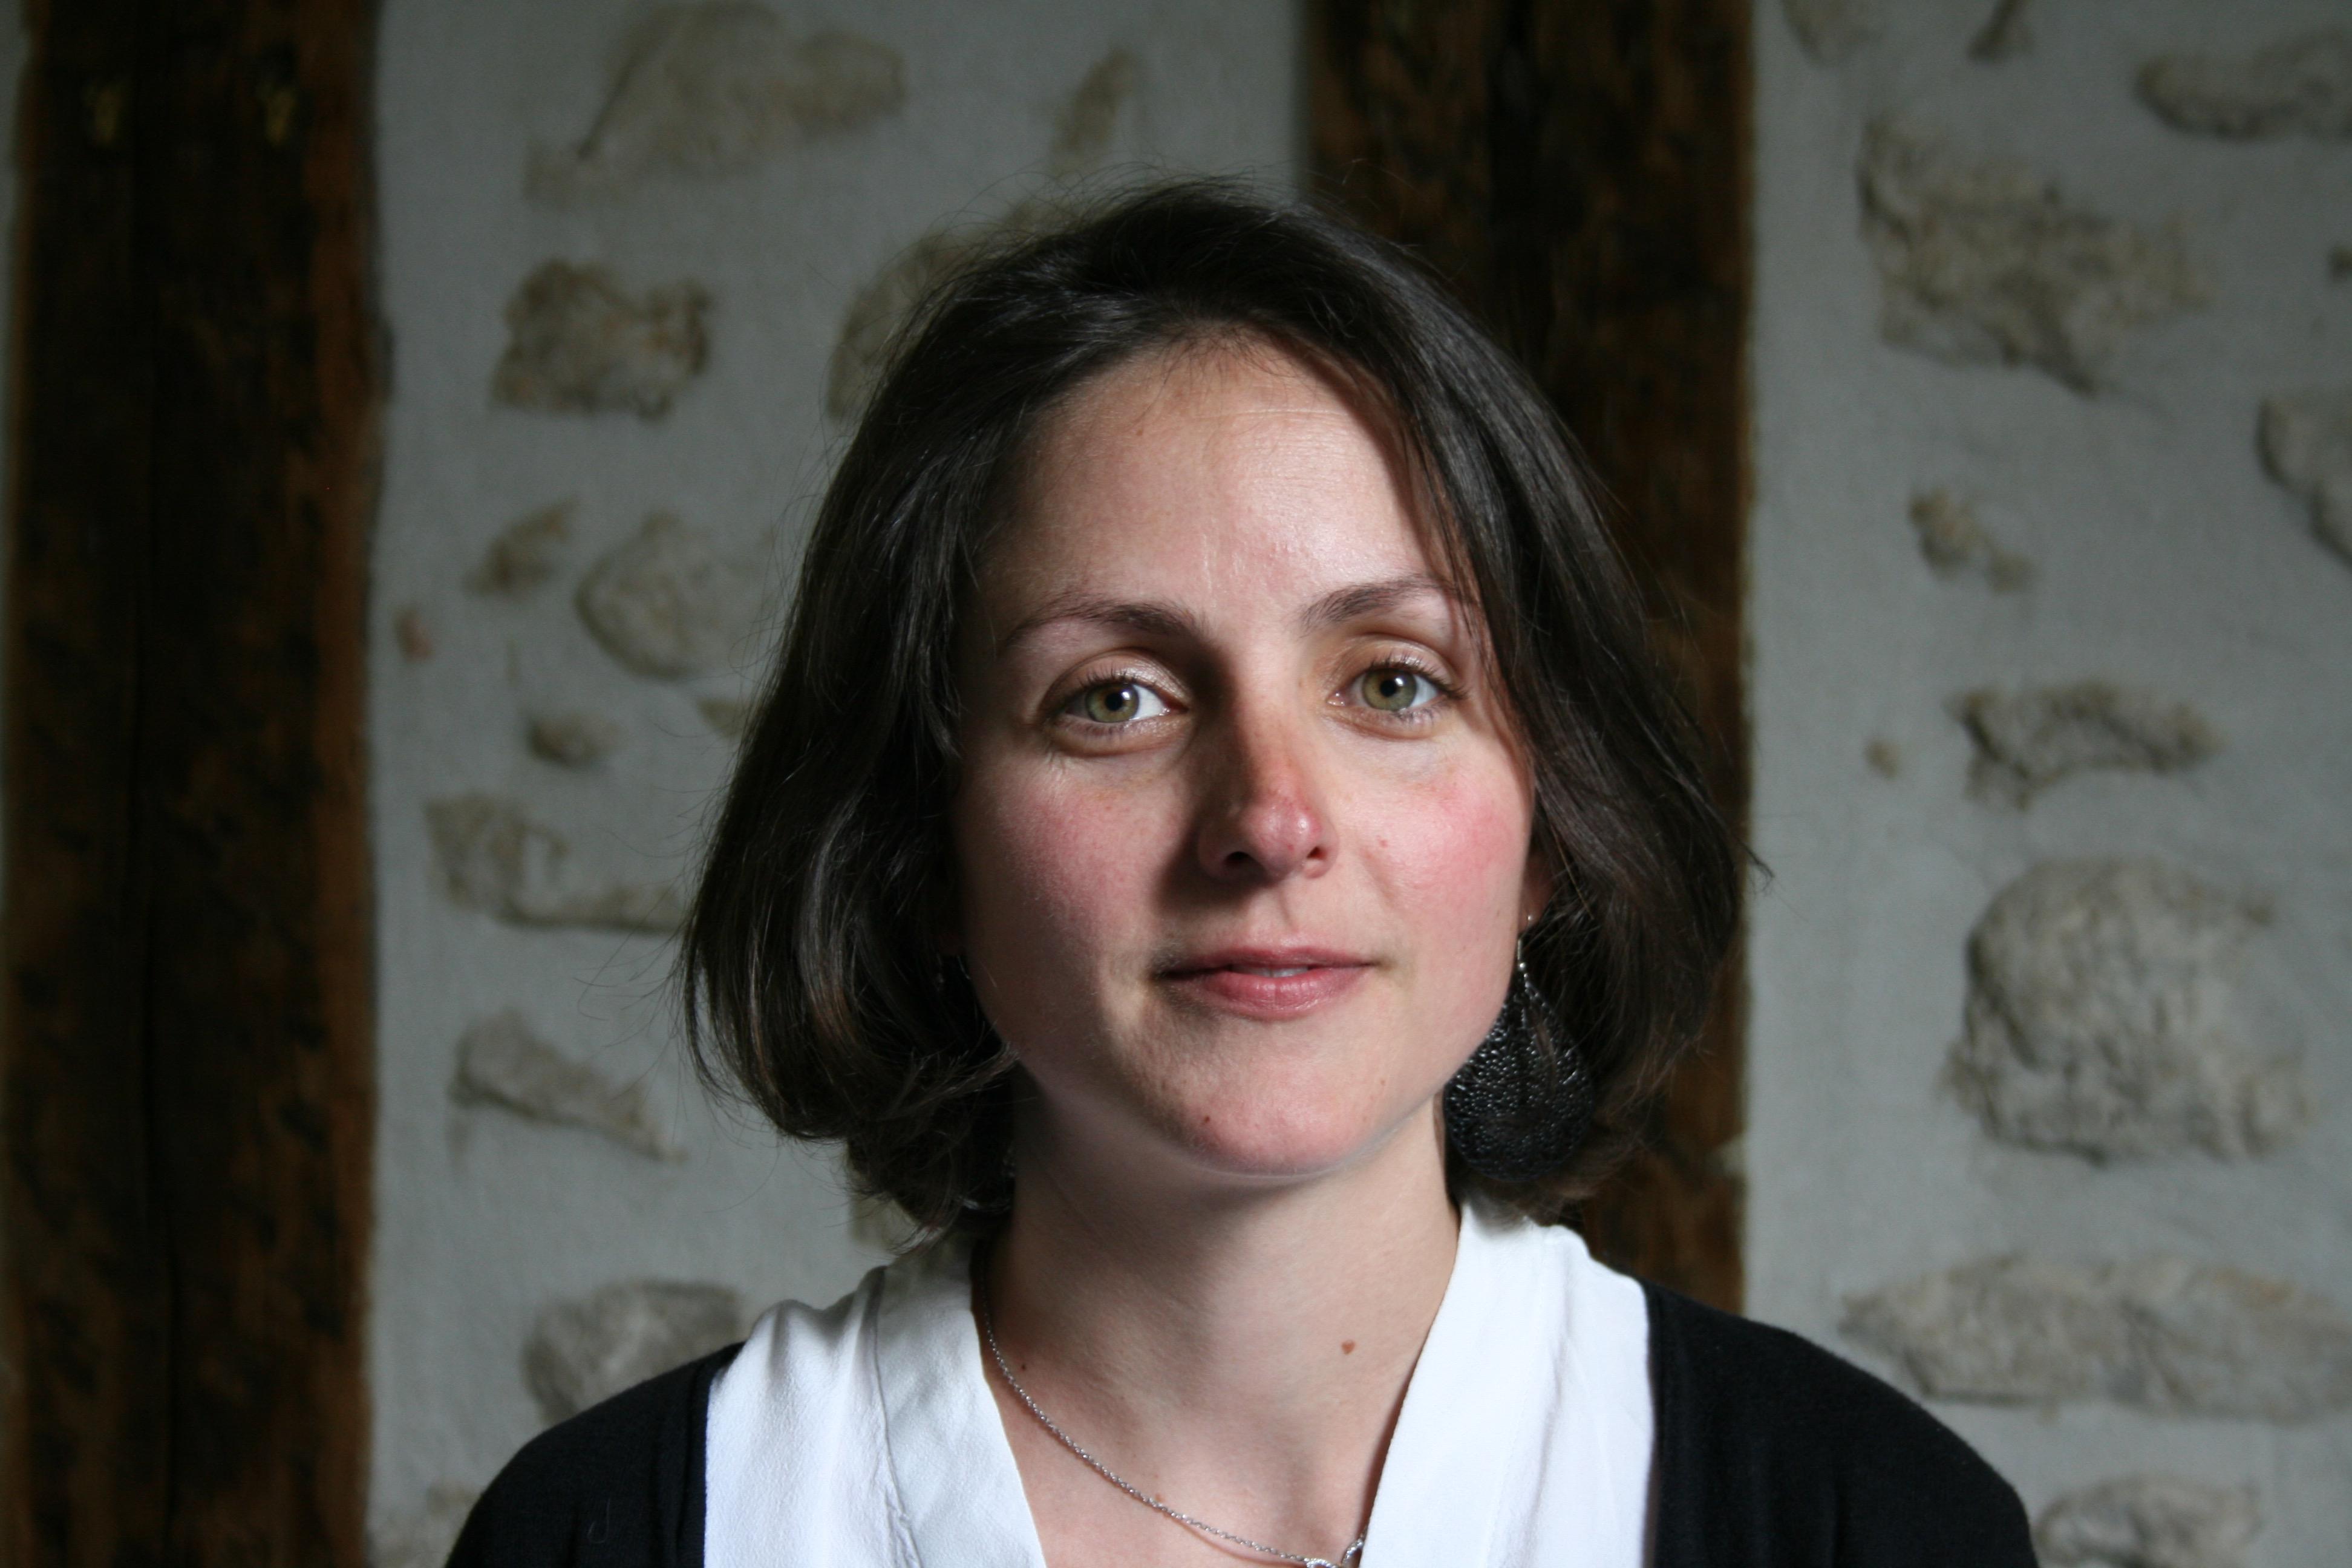 Nathalie Bonardet